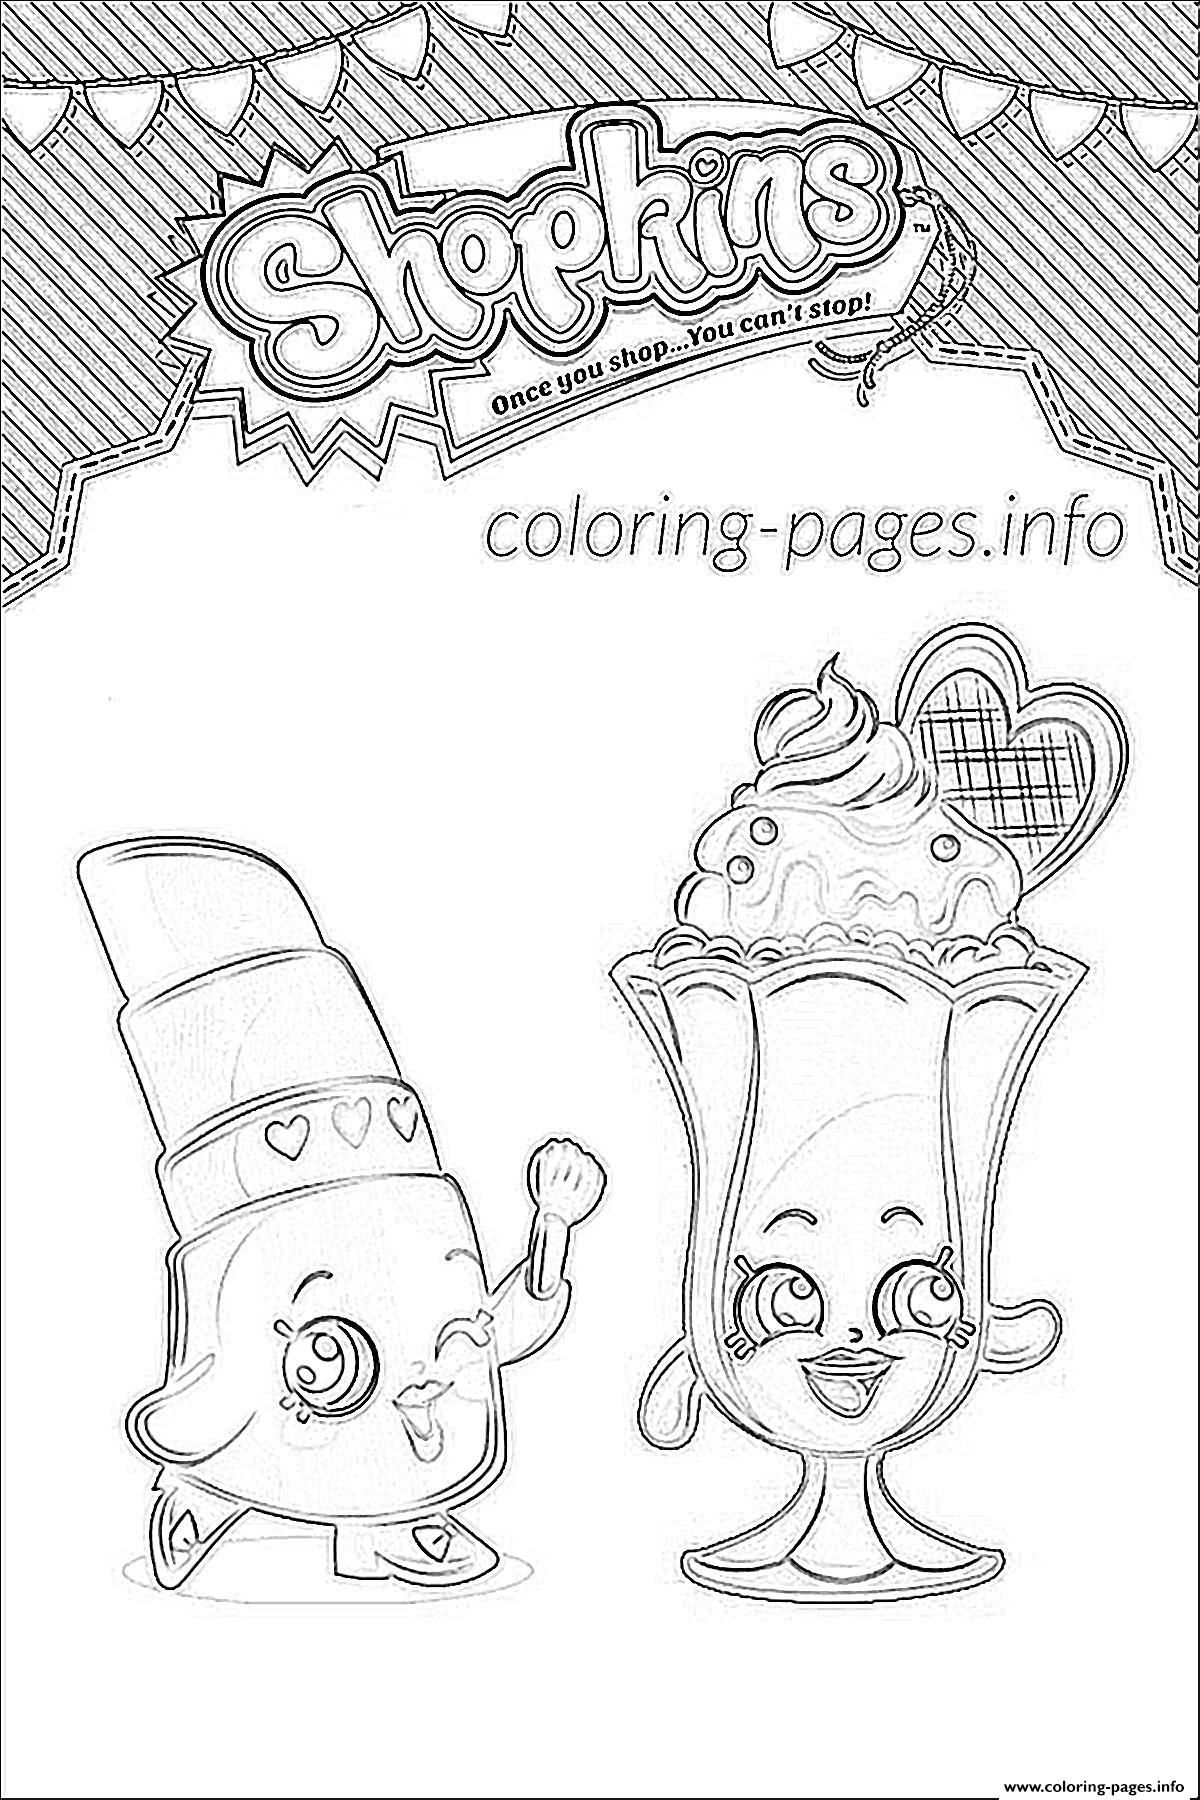 Print Shopkins Suzie Sundae Coloring Pages Shopkins Coloring